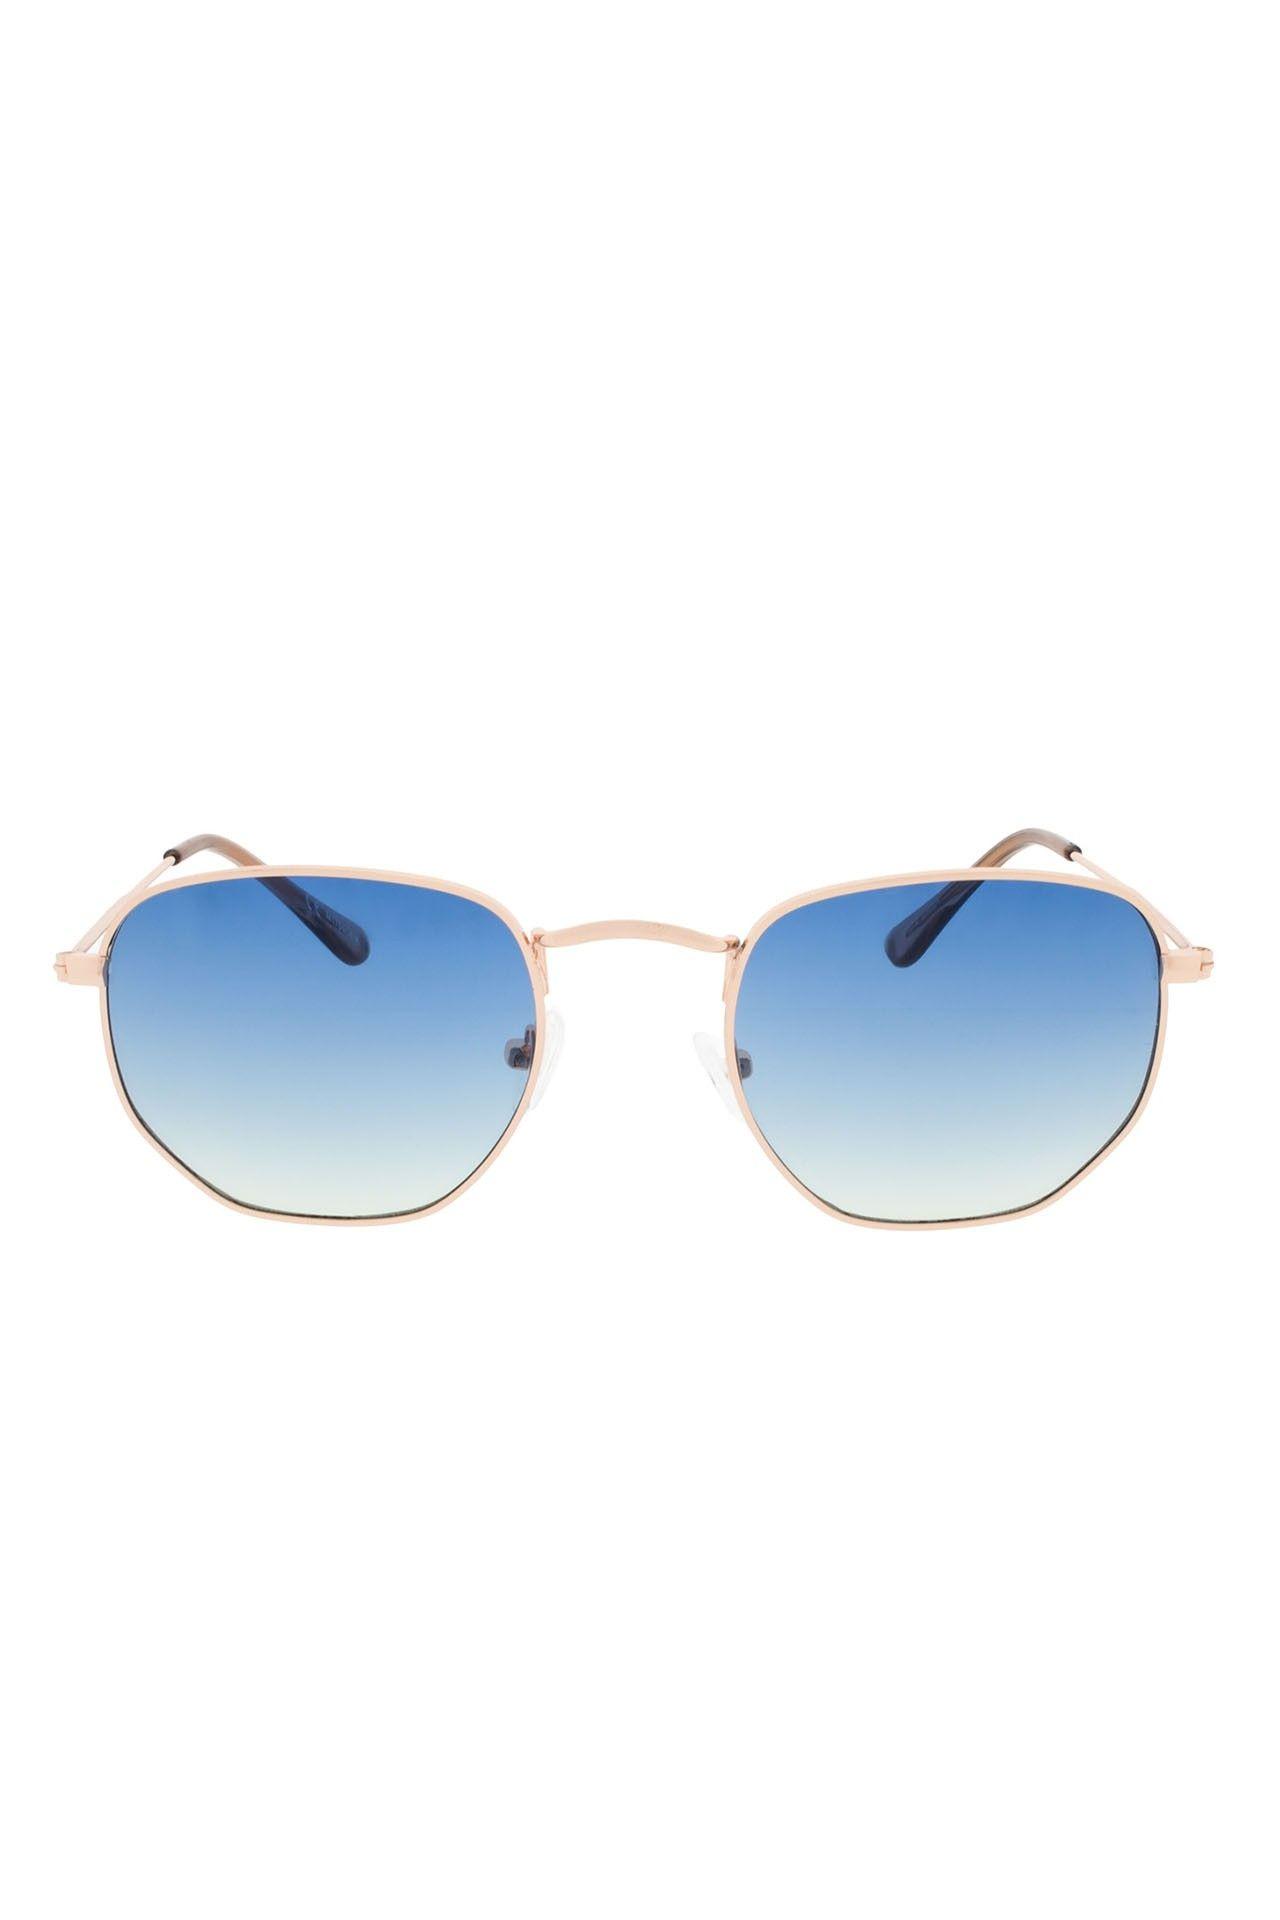 Afbeelding van Icon Eyewear M170904 M170904 Zonnebril Pale Gold